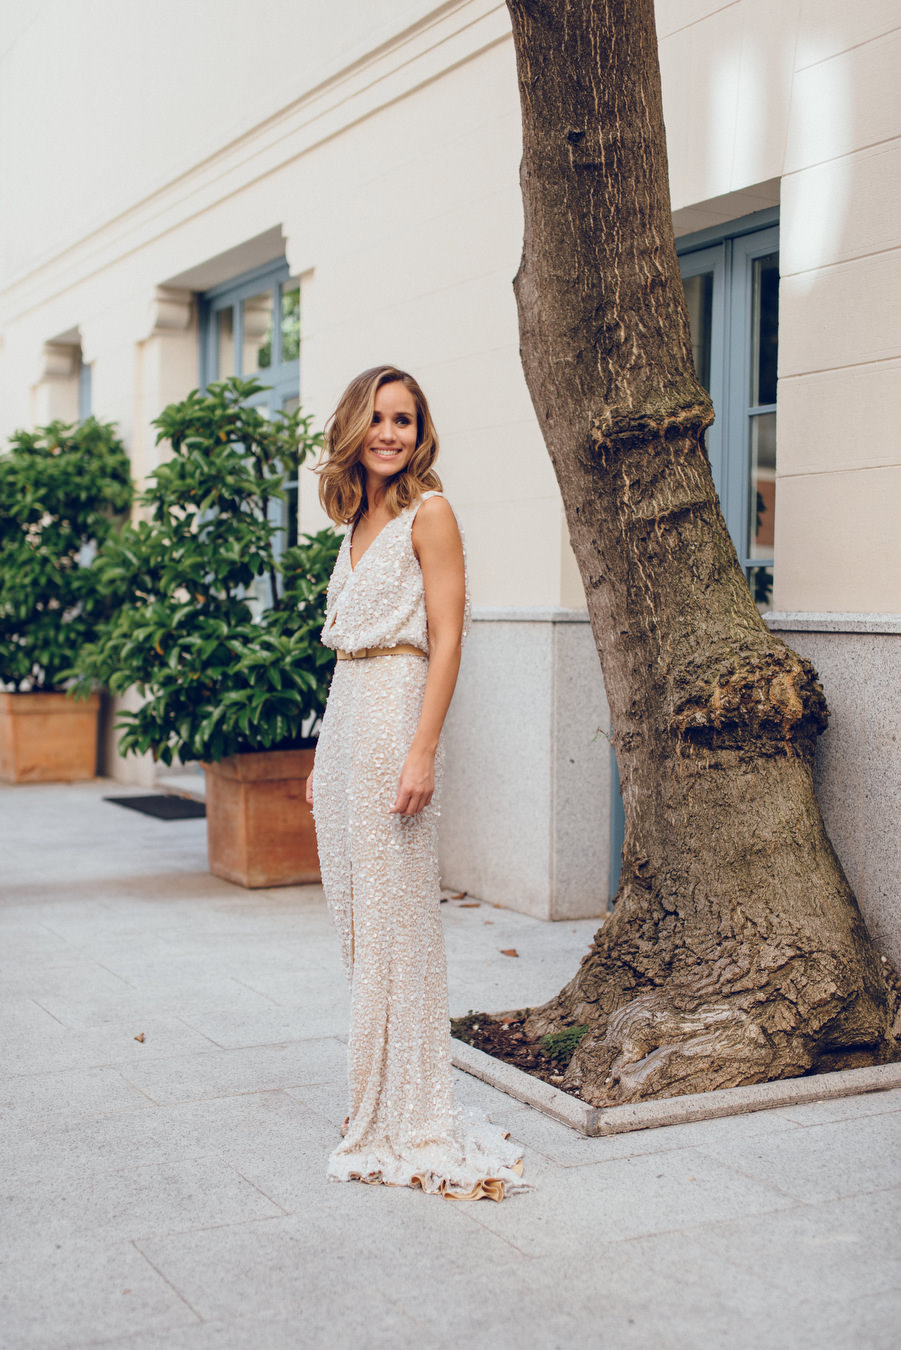 calista-one-lista-de-bodas-online-blog-de-bodas-bossanova-looks-invitadas-pepe-botella-8